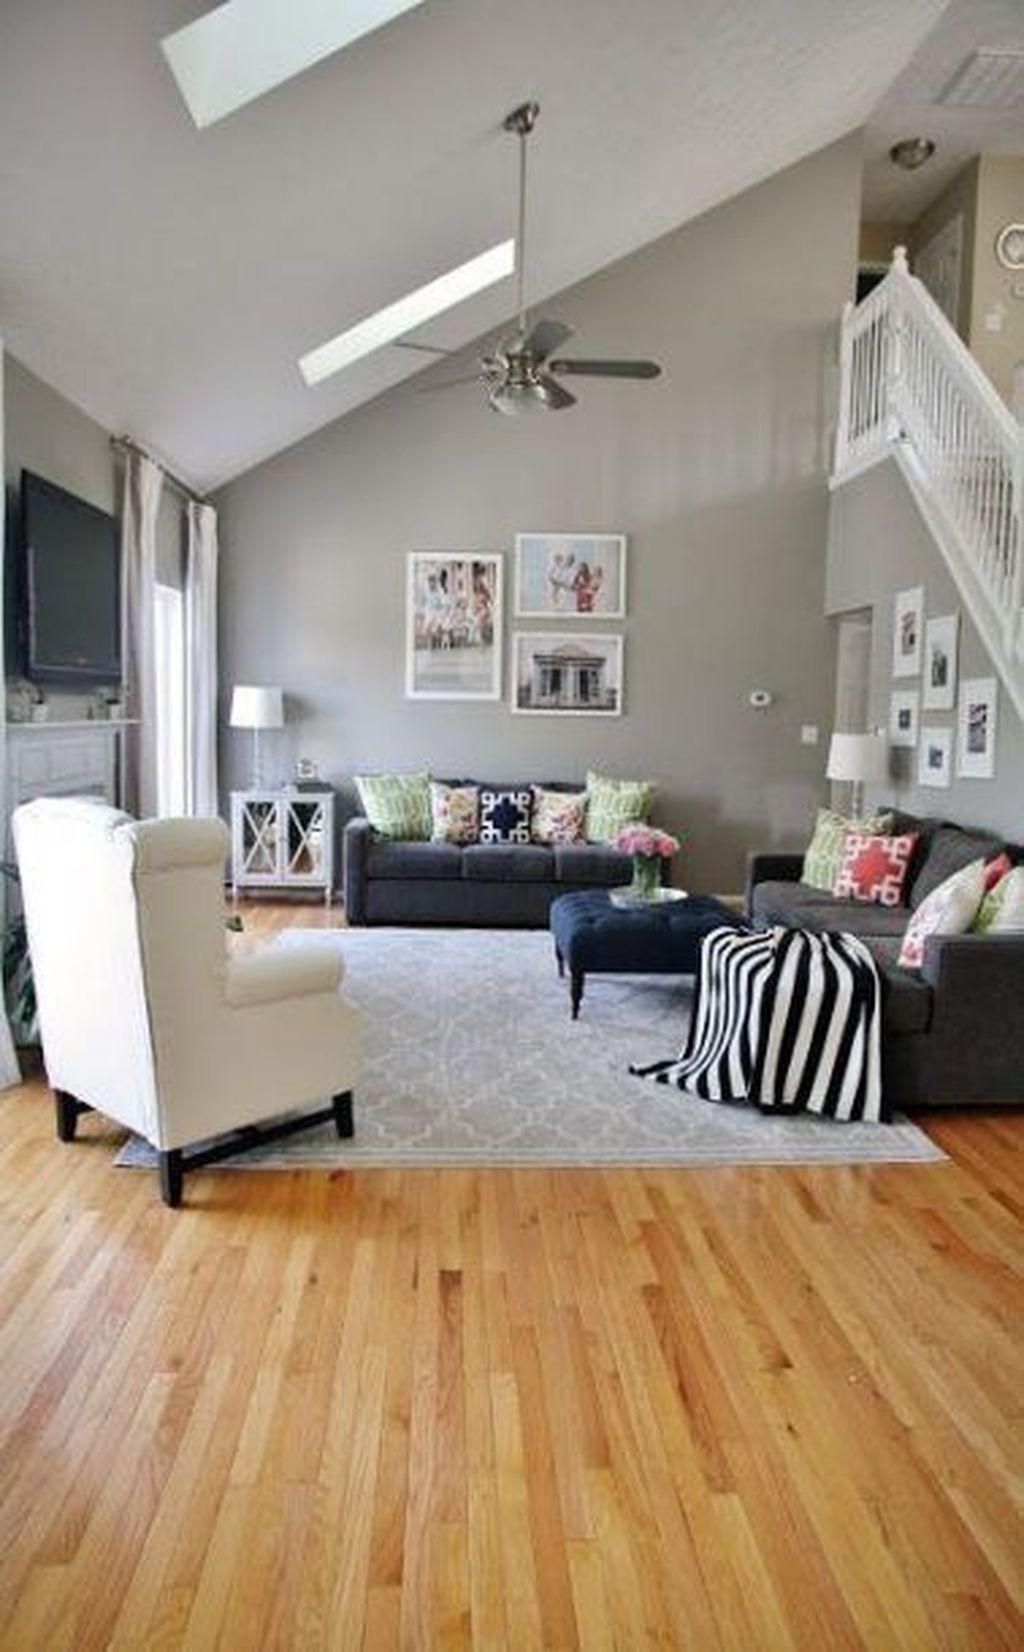 34 Amazing Bamboo Flooring Ideas For Living Room Homyhomee Living Room Wood Floor Living Room Decor Grey Walls Living Room Grey